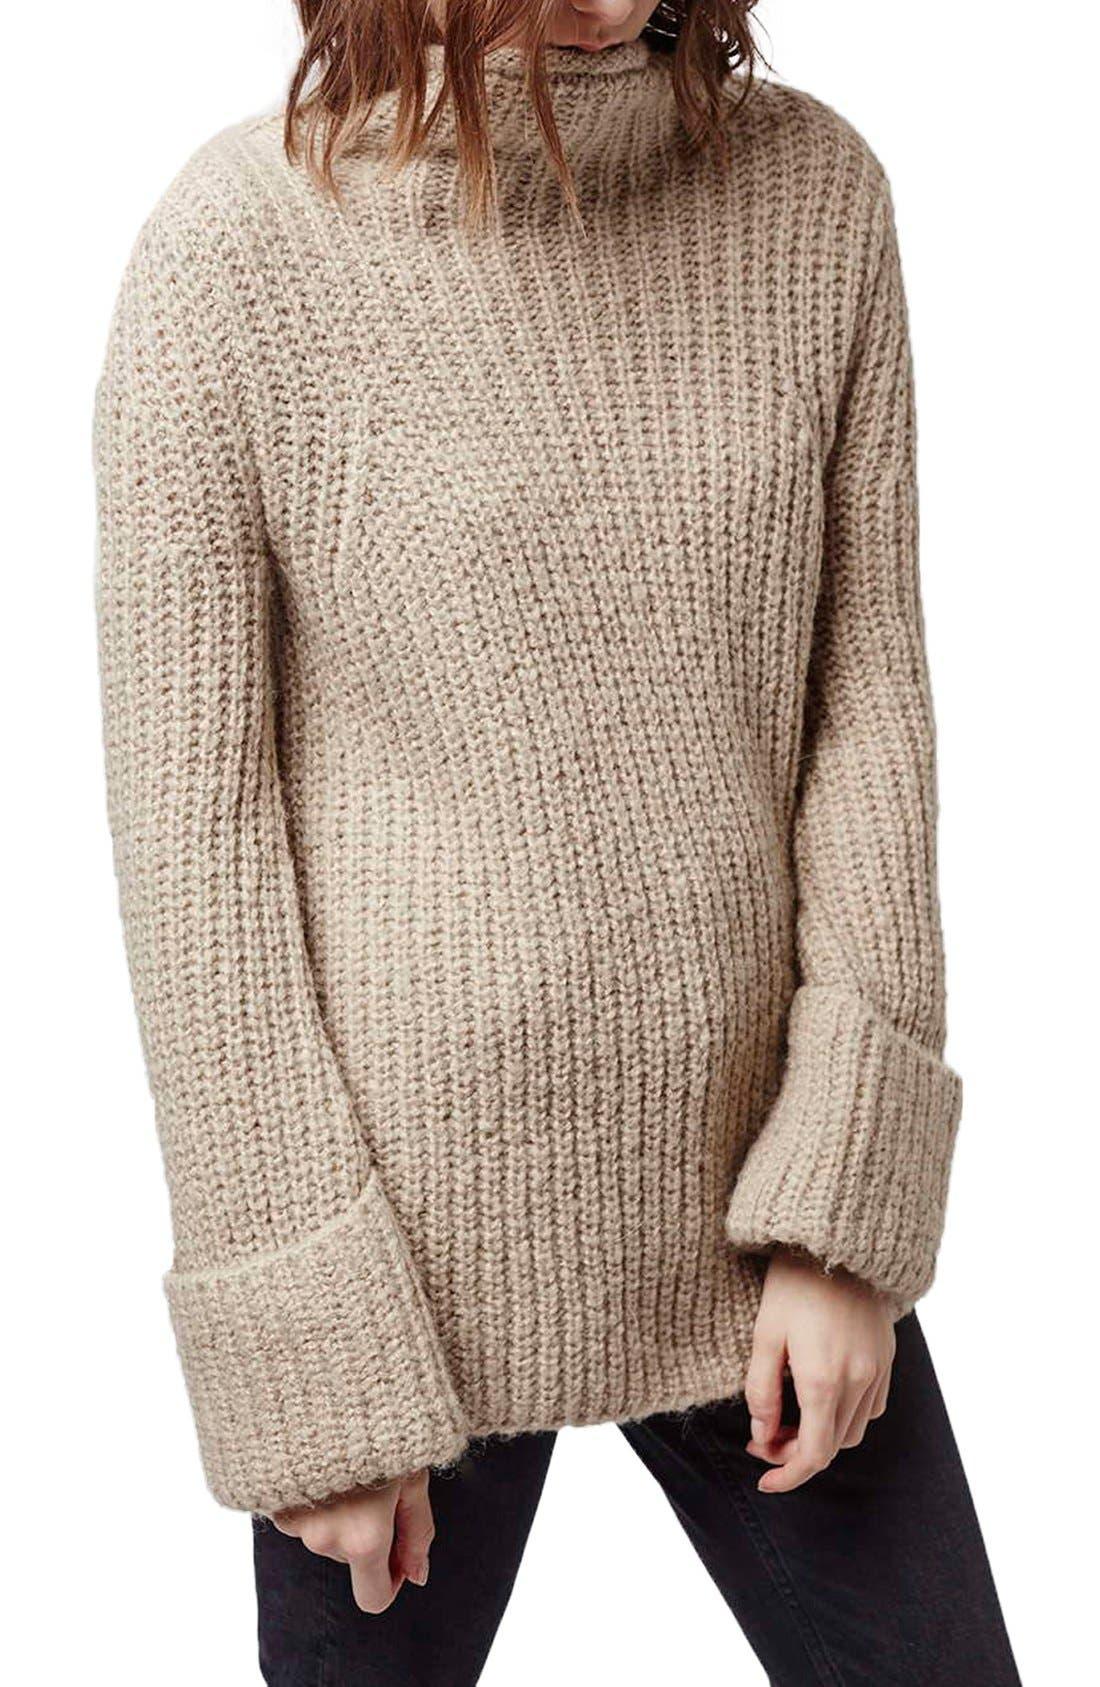 Alternate Image 1 Selected - Topshop 'Jumbo' Funnel Neck Sweater